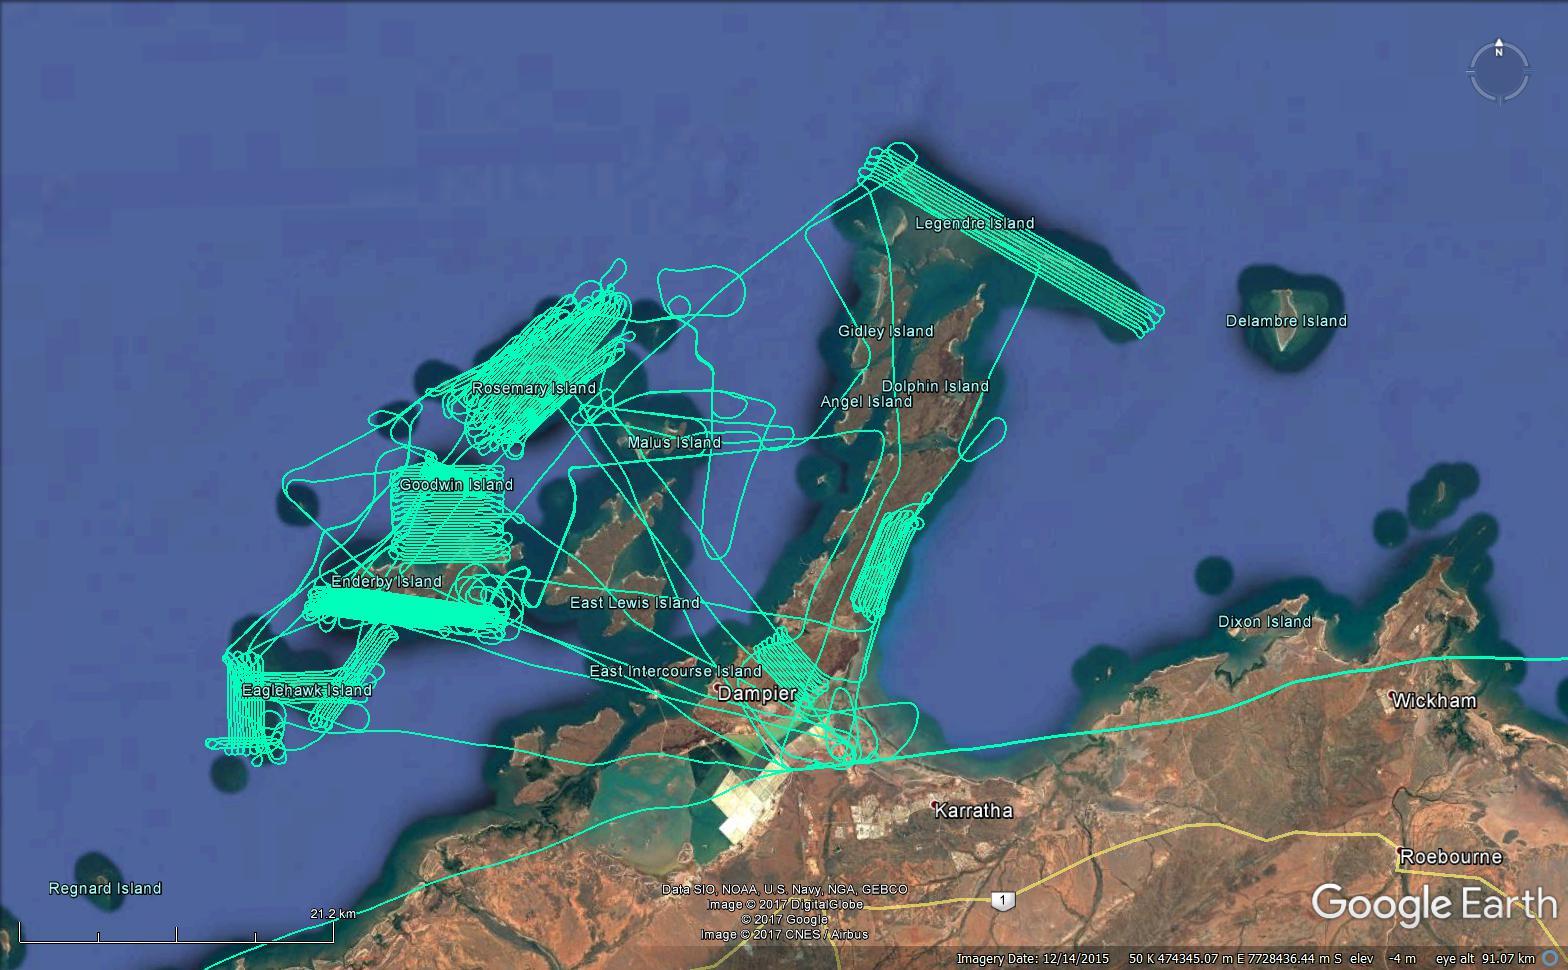 DHSC- MappingFlighttracks